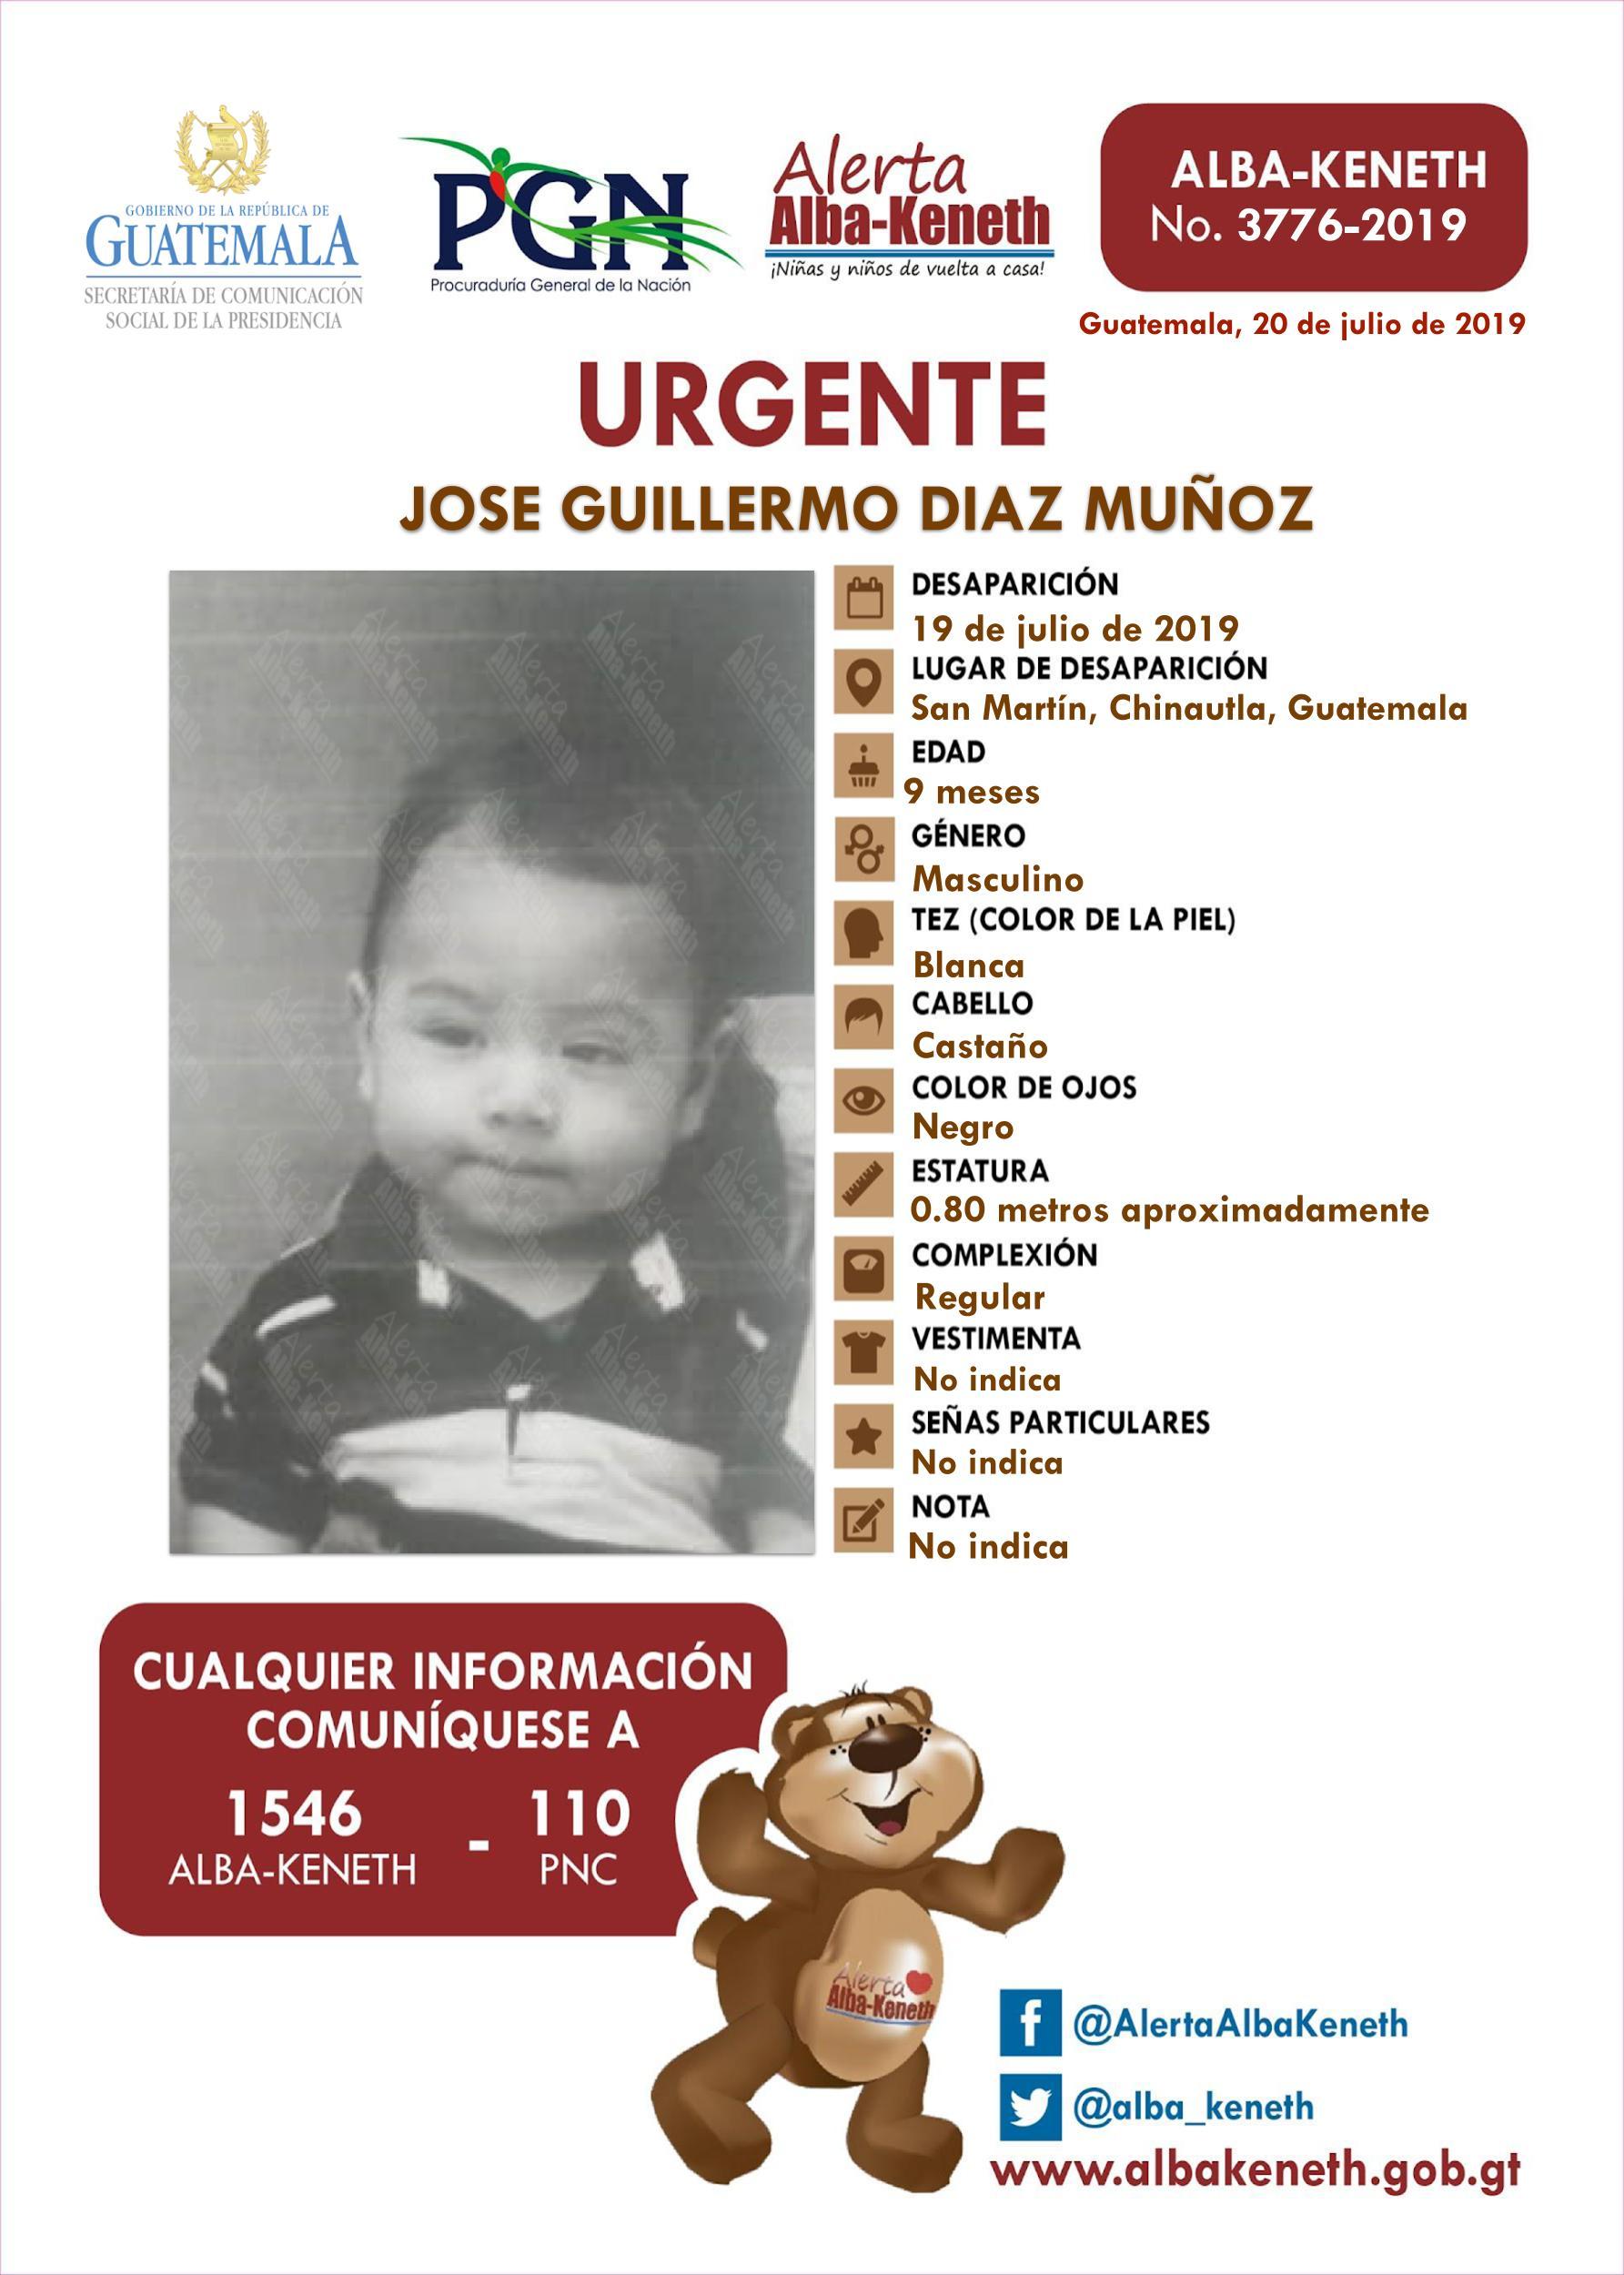 Jose Guillermo Diaz Muñoz